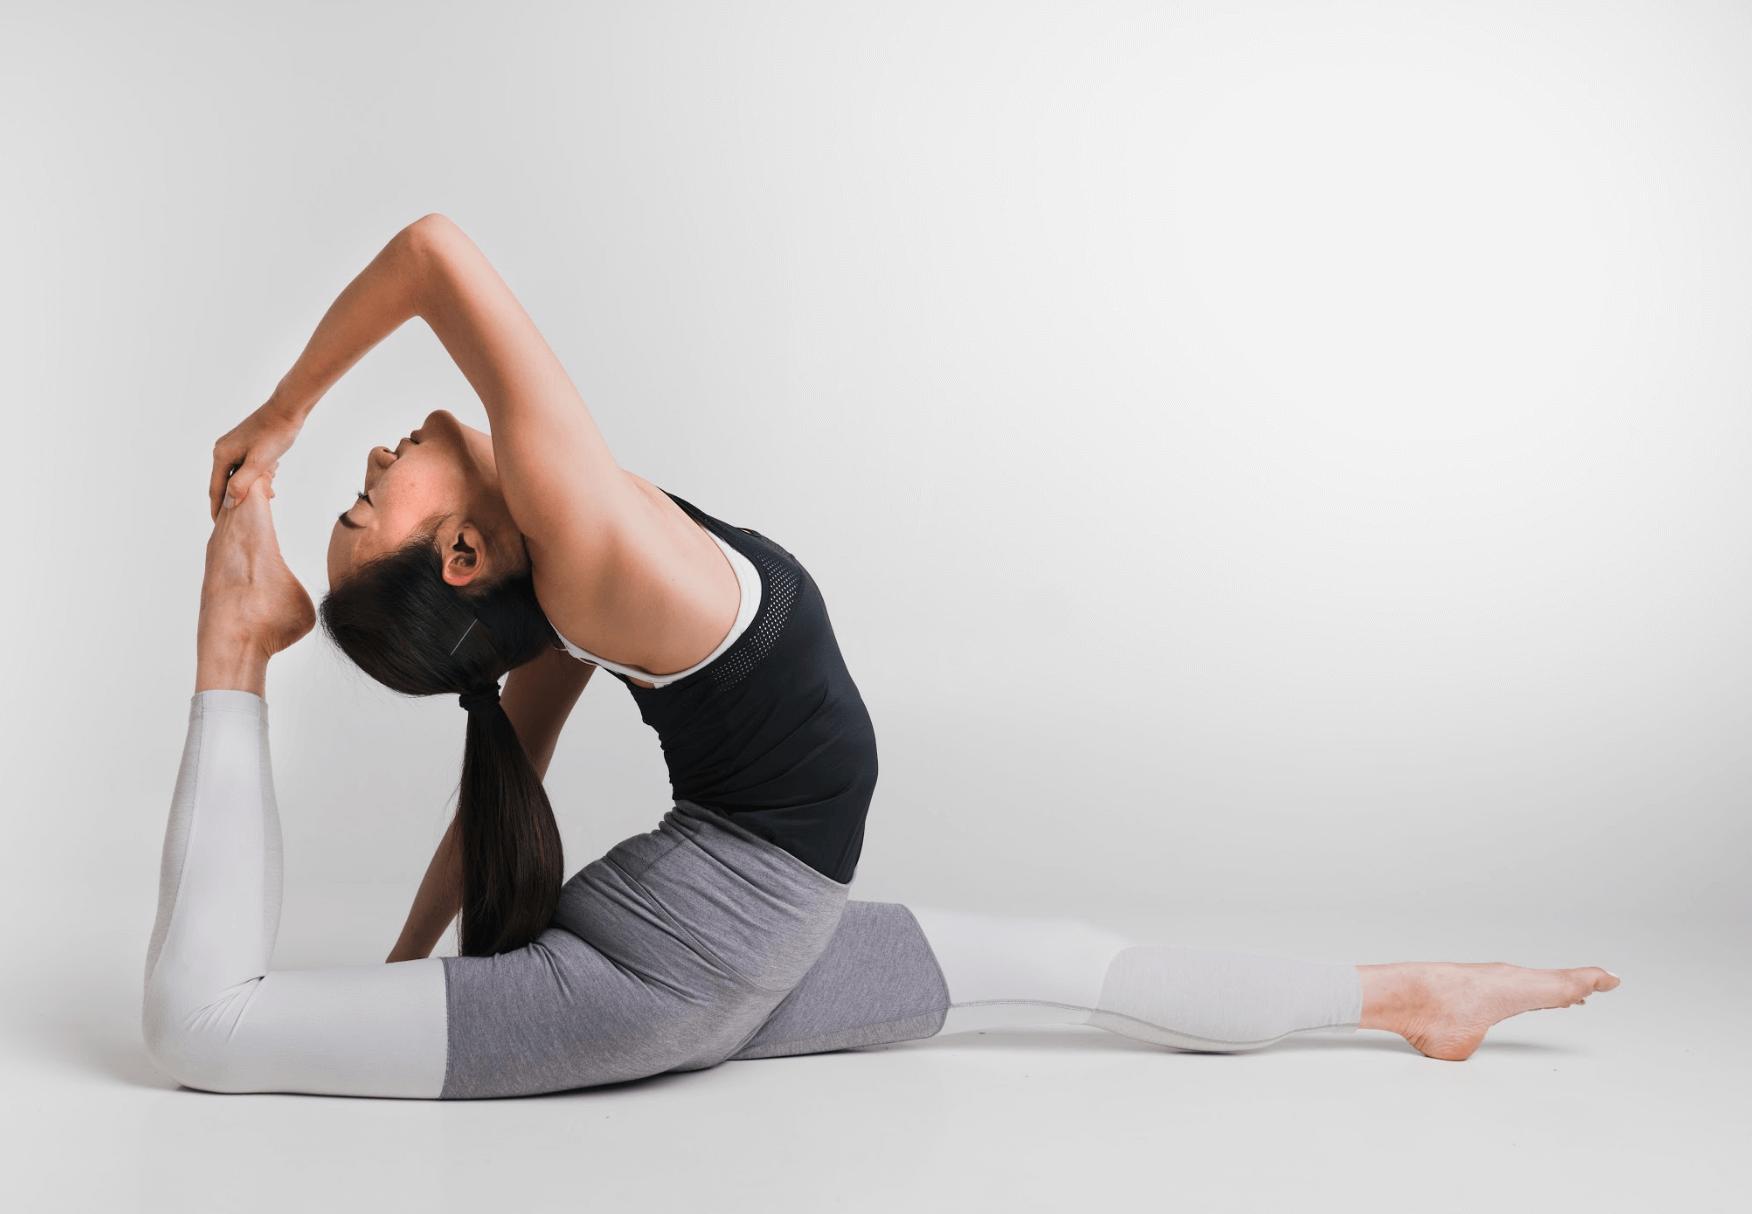 Monday Motivation: Breathing Exercises To De-Stress Feat. Delia Leung